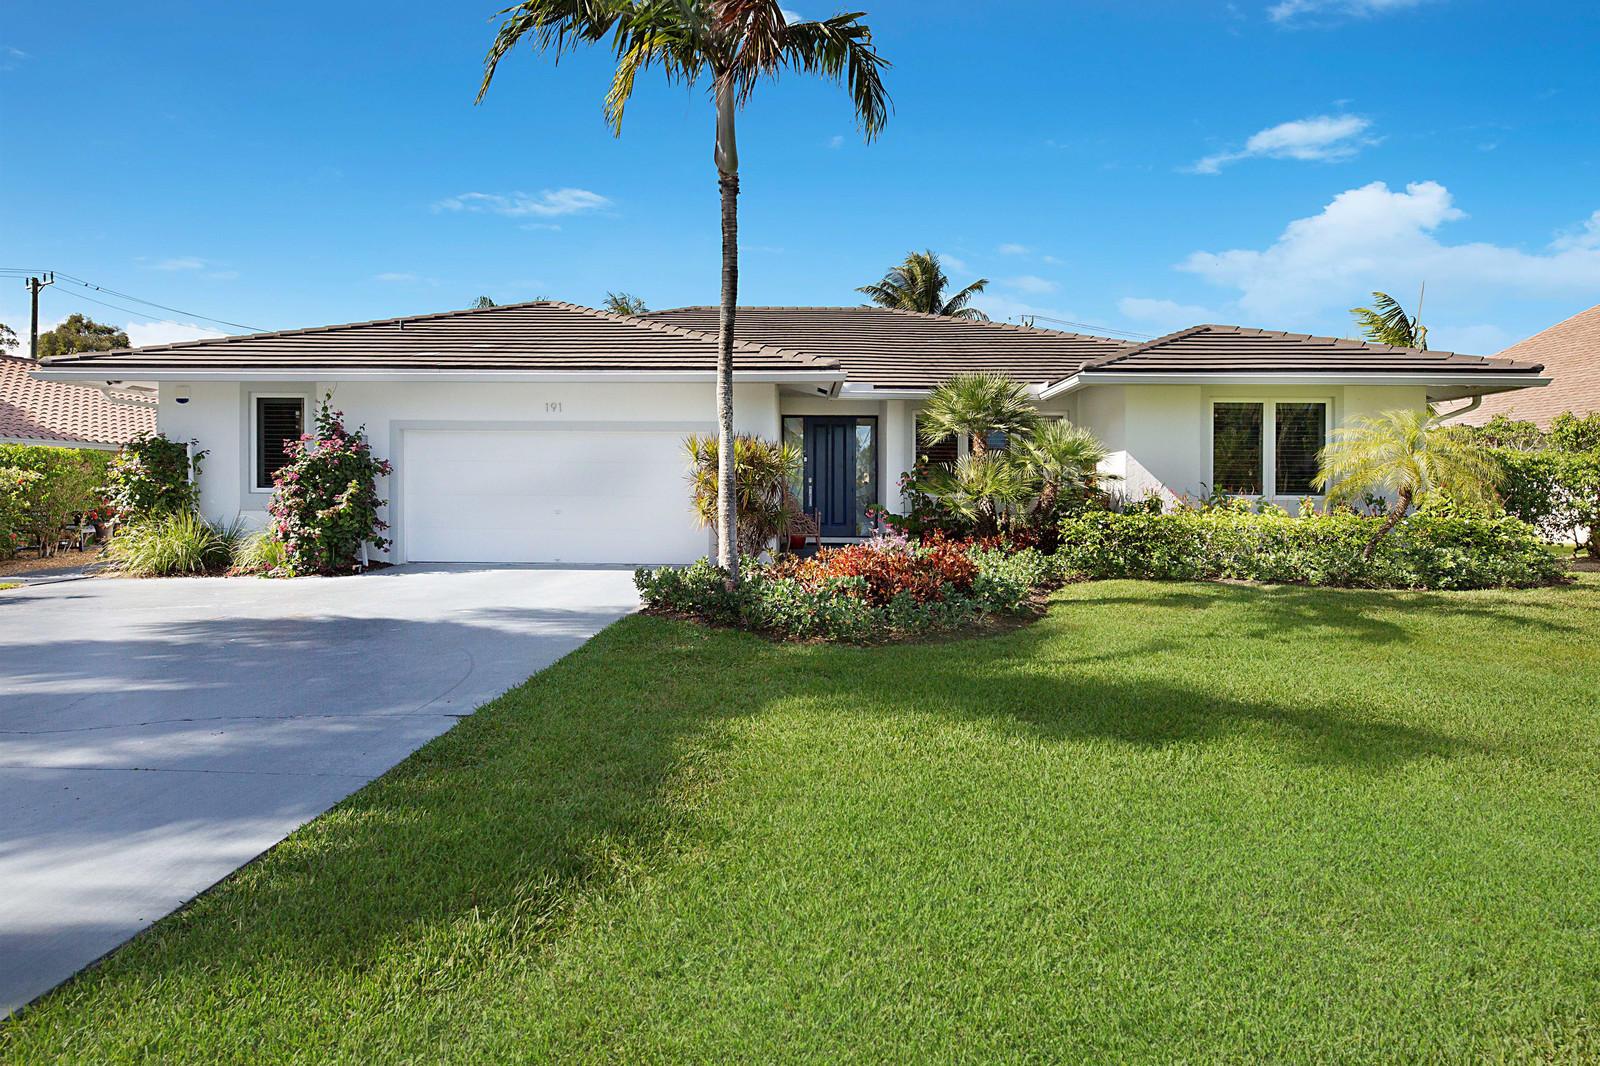 191 S Country Club Boulevard Boca Raton, FL 33487